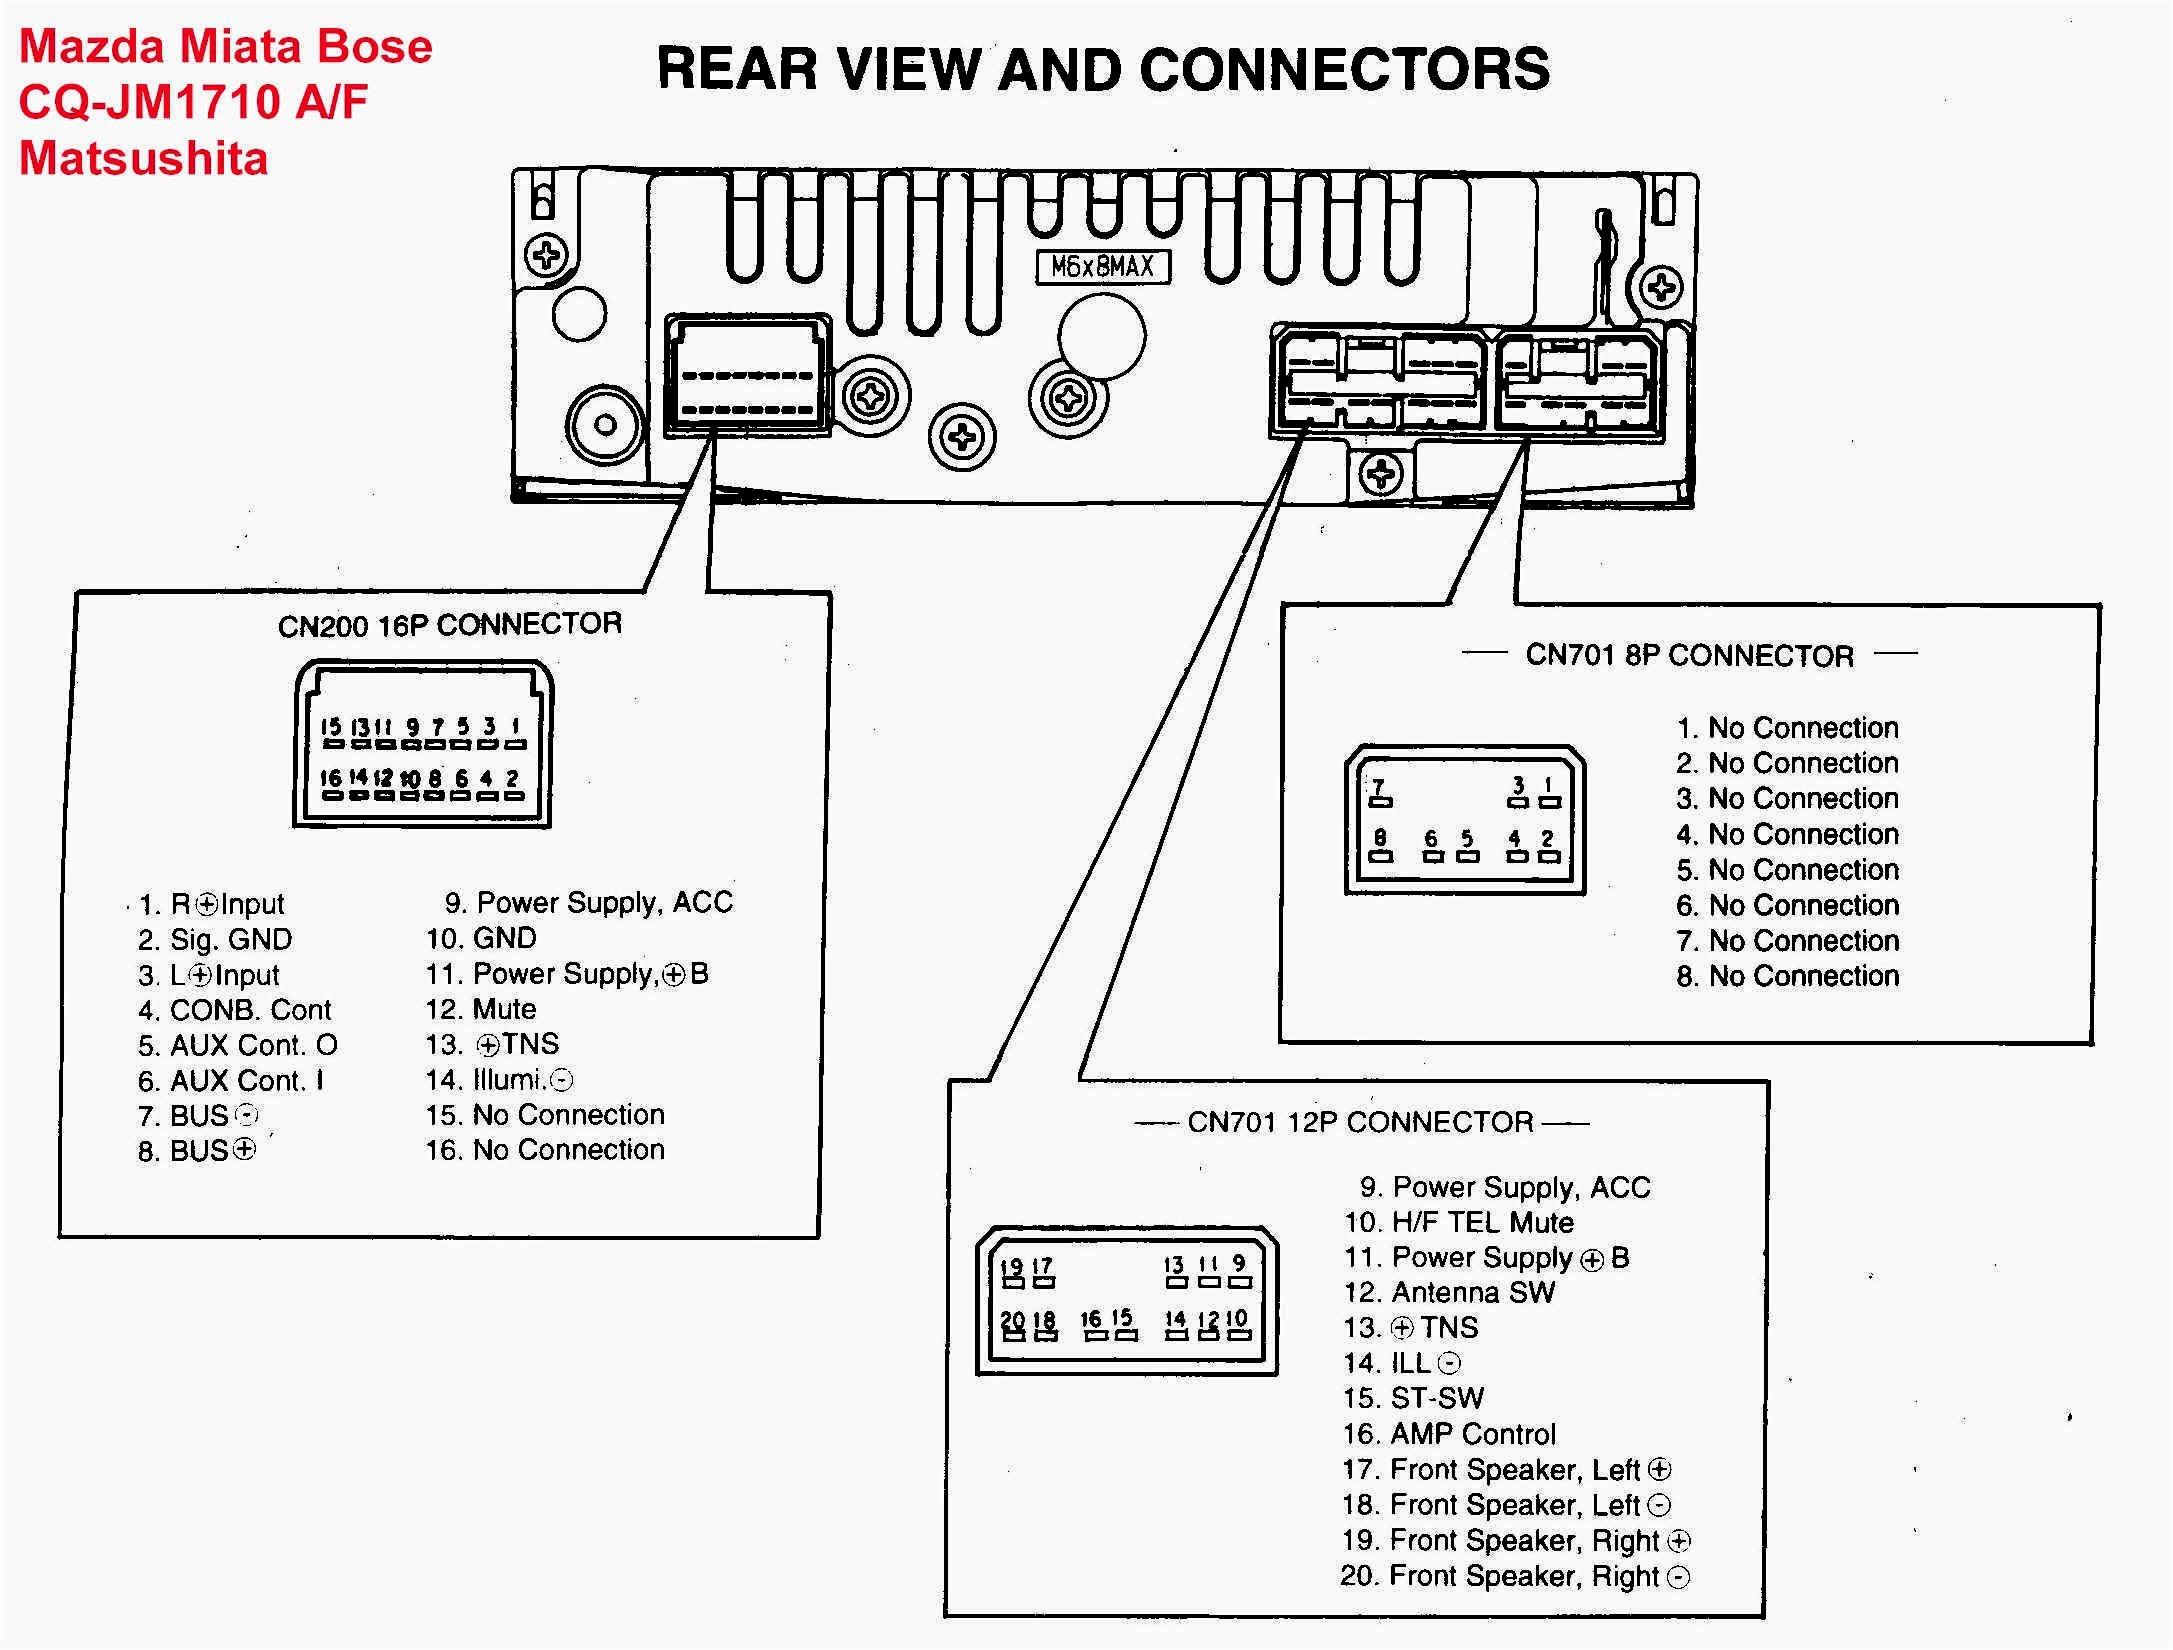 pioneer p1400dvd wiring harness cf367 pioneer 4400bh 16 pin wiring harness wiring library  pioneer 4400bh 16 pin wiring harness